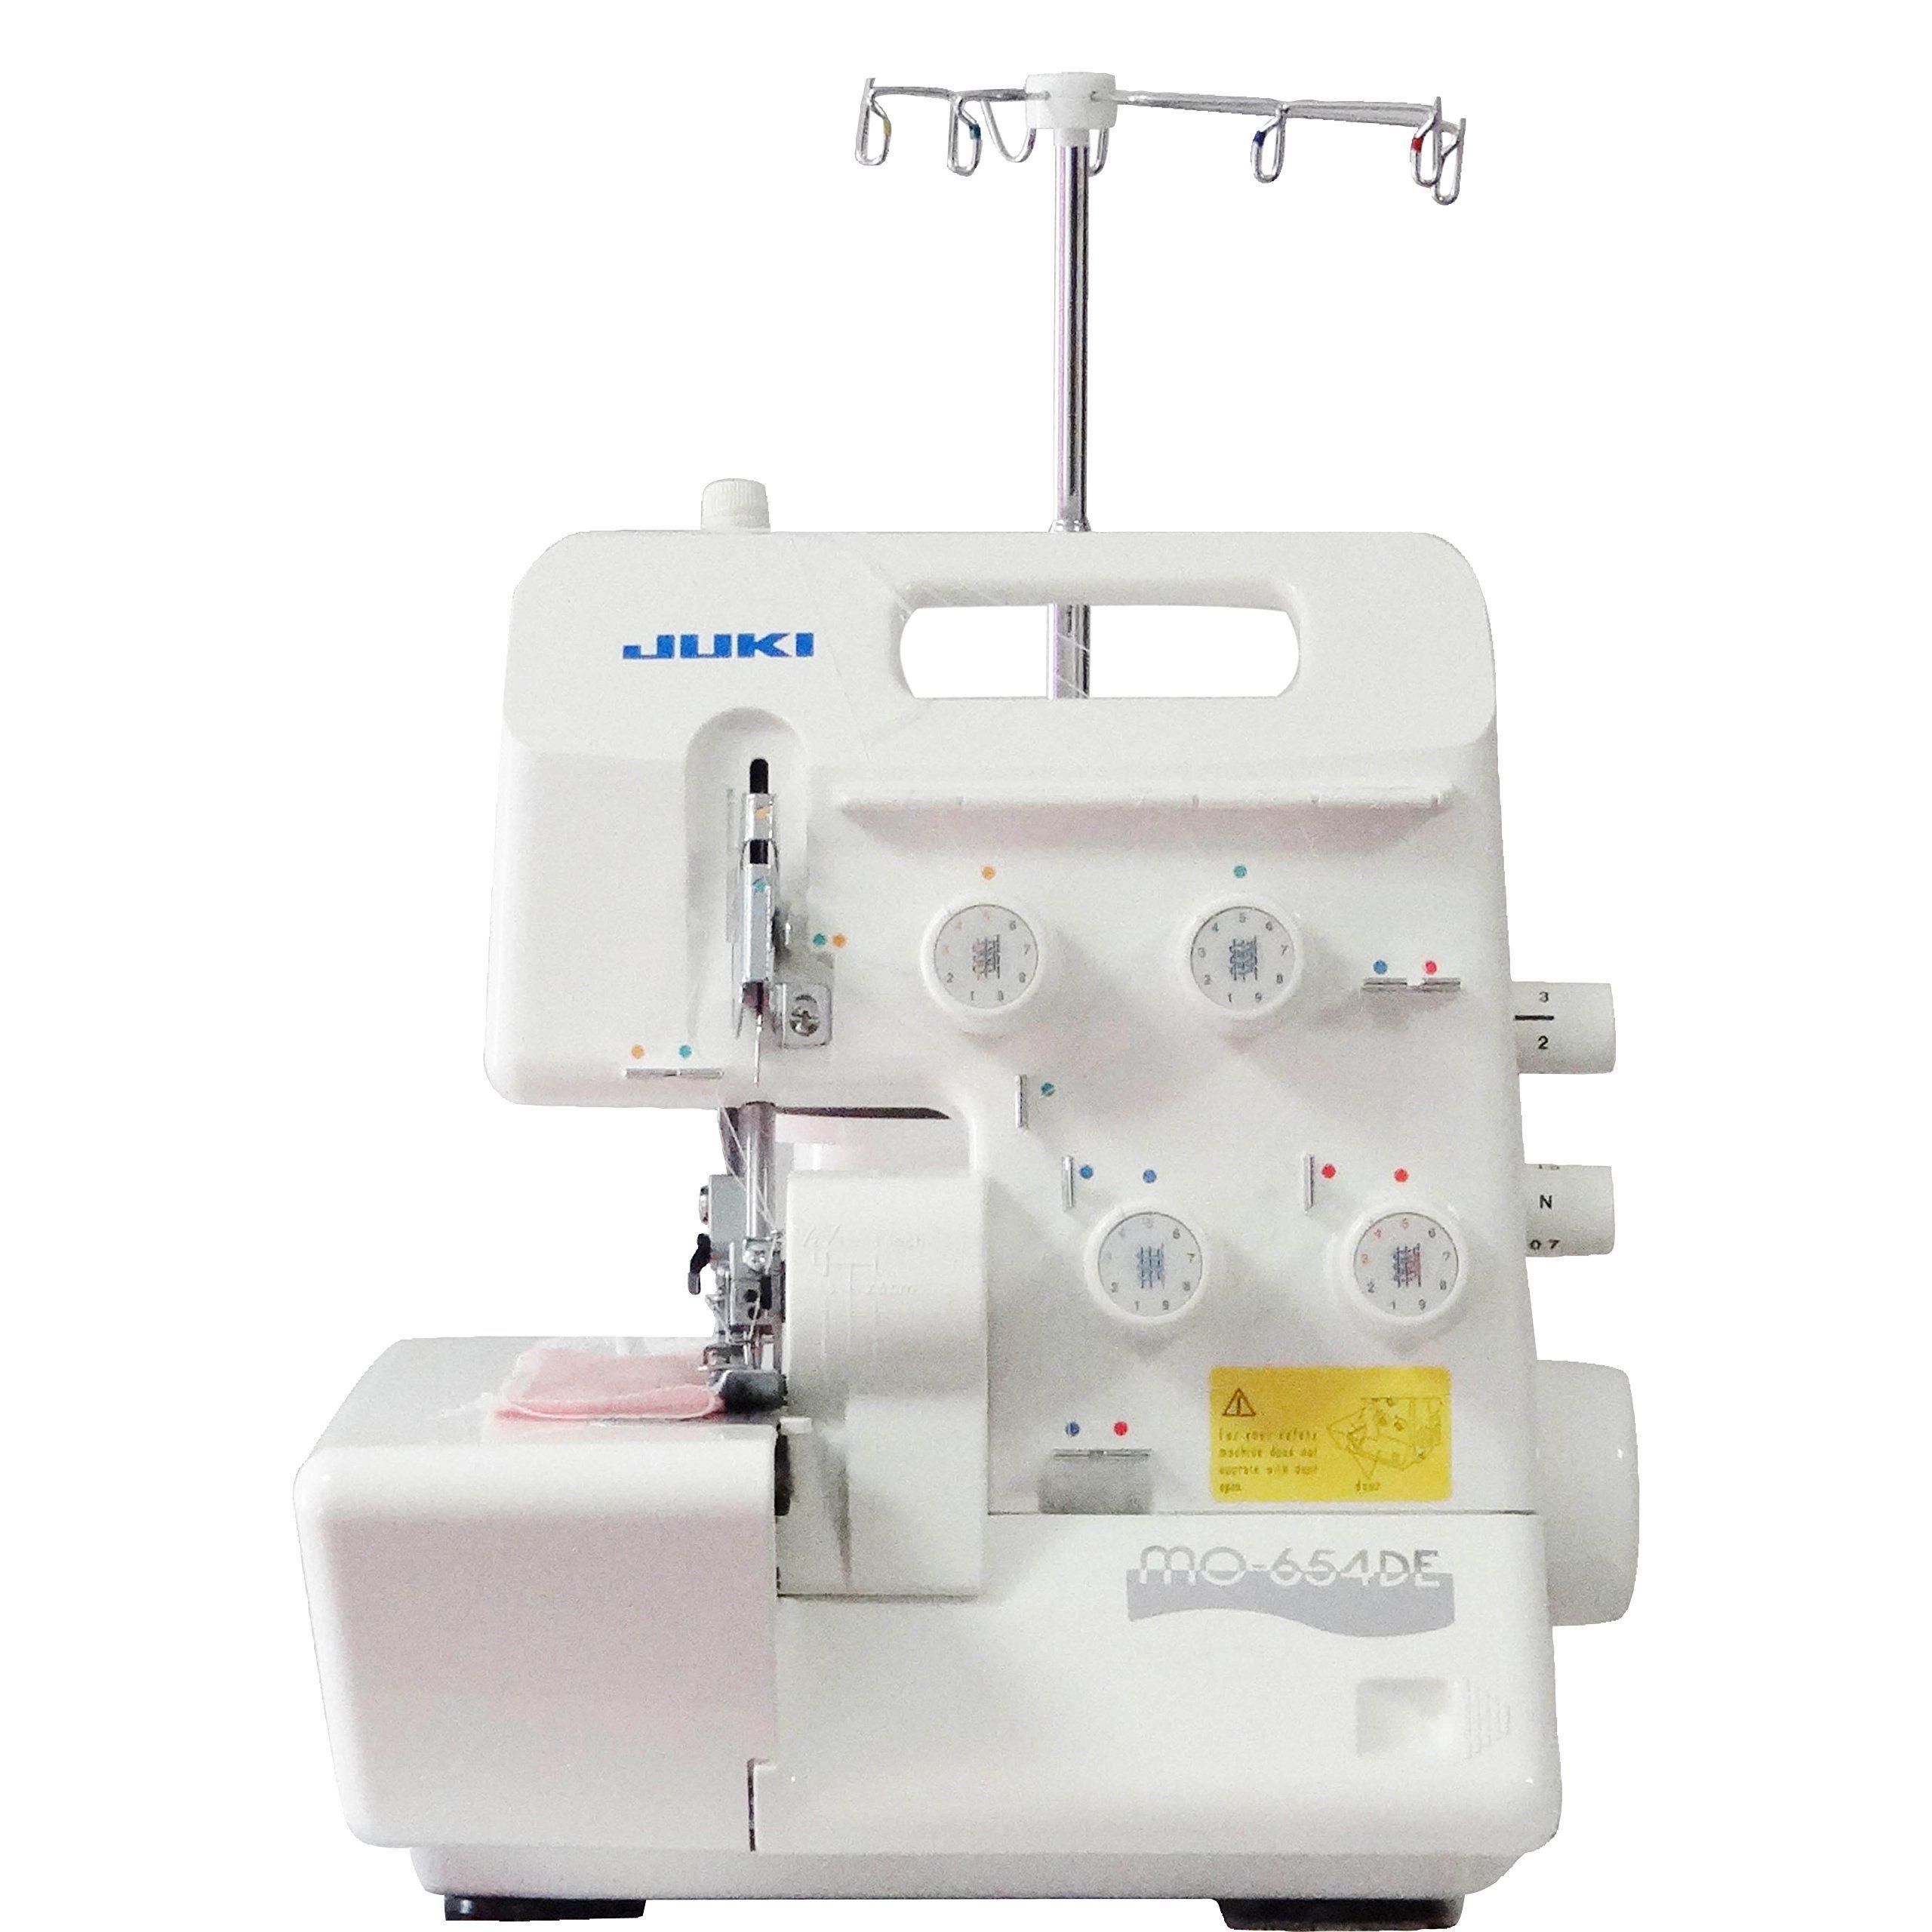 JUKI MO654DE Portable Thread Serger Sewing Machine -- You can get ...